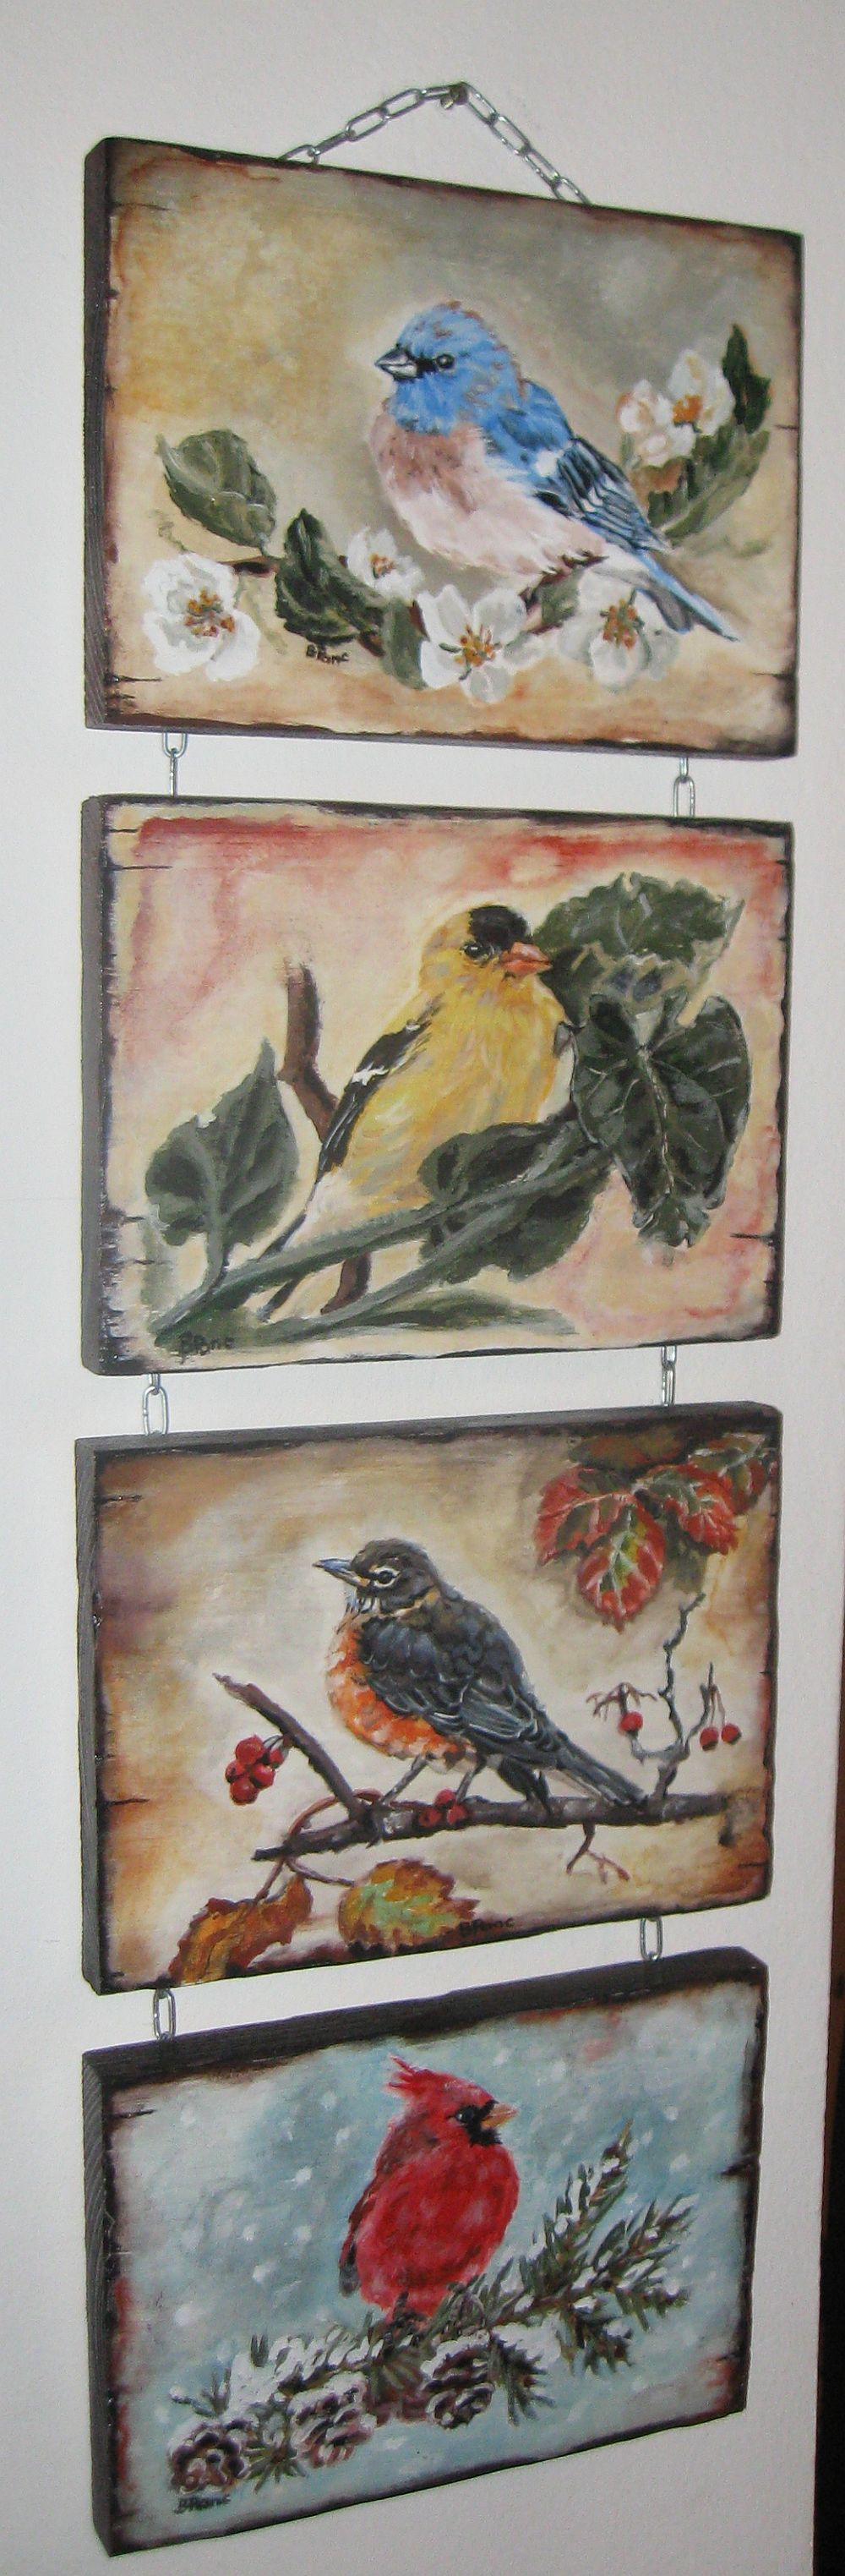 adelaparvu.com despre tablouri, cufere si mic mobilier pictate, design Brindusa Art, artizan Brindusa Panc (12)